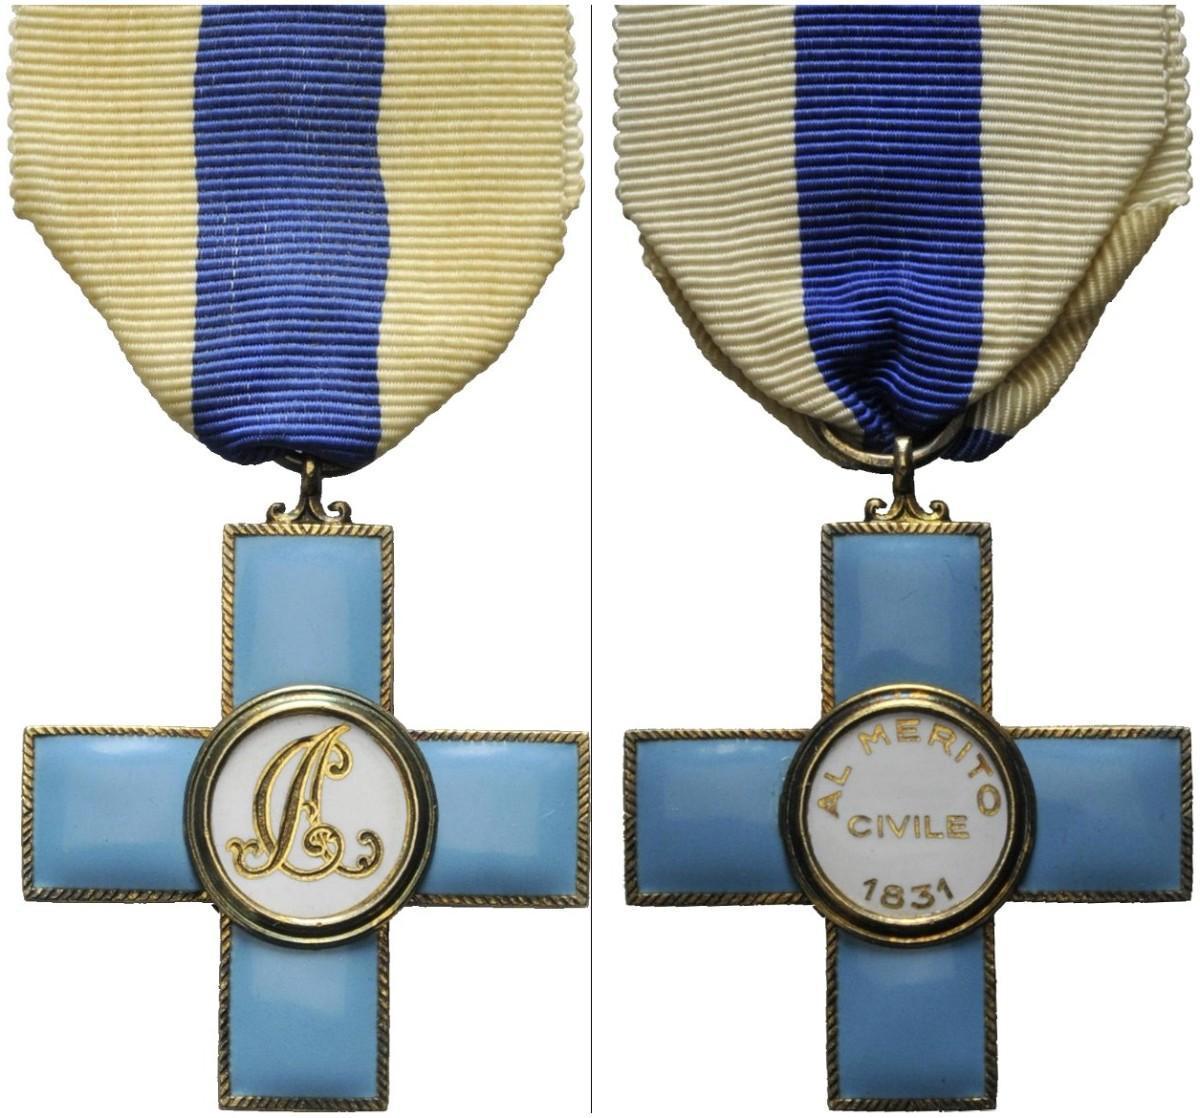 Numisbids numismatica ranieri s r l auction 10 lot 226 - Decorazioni italiane ...